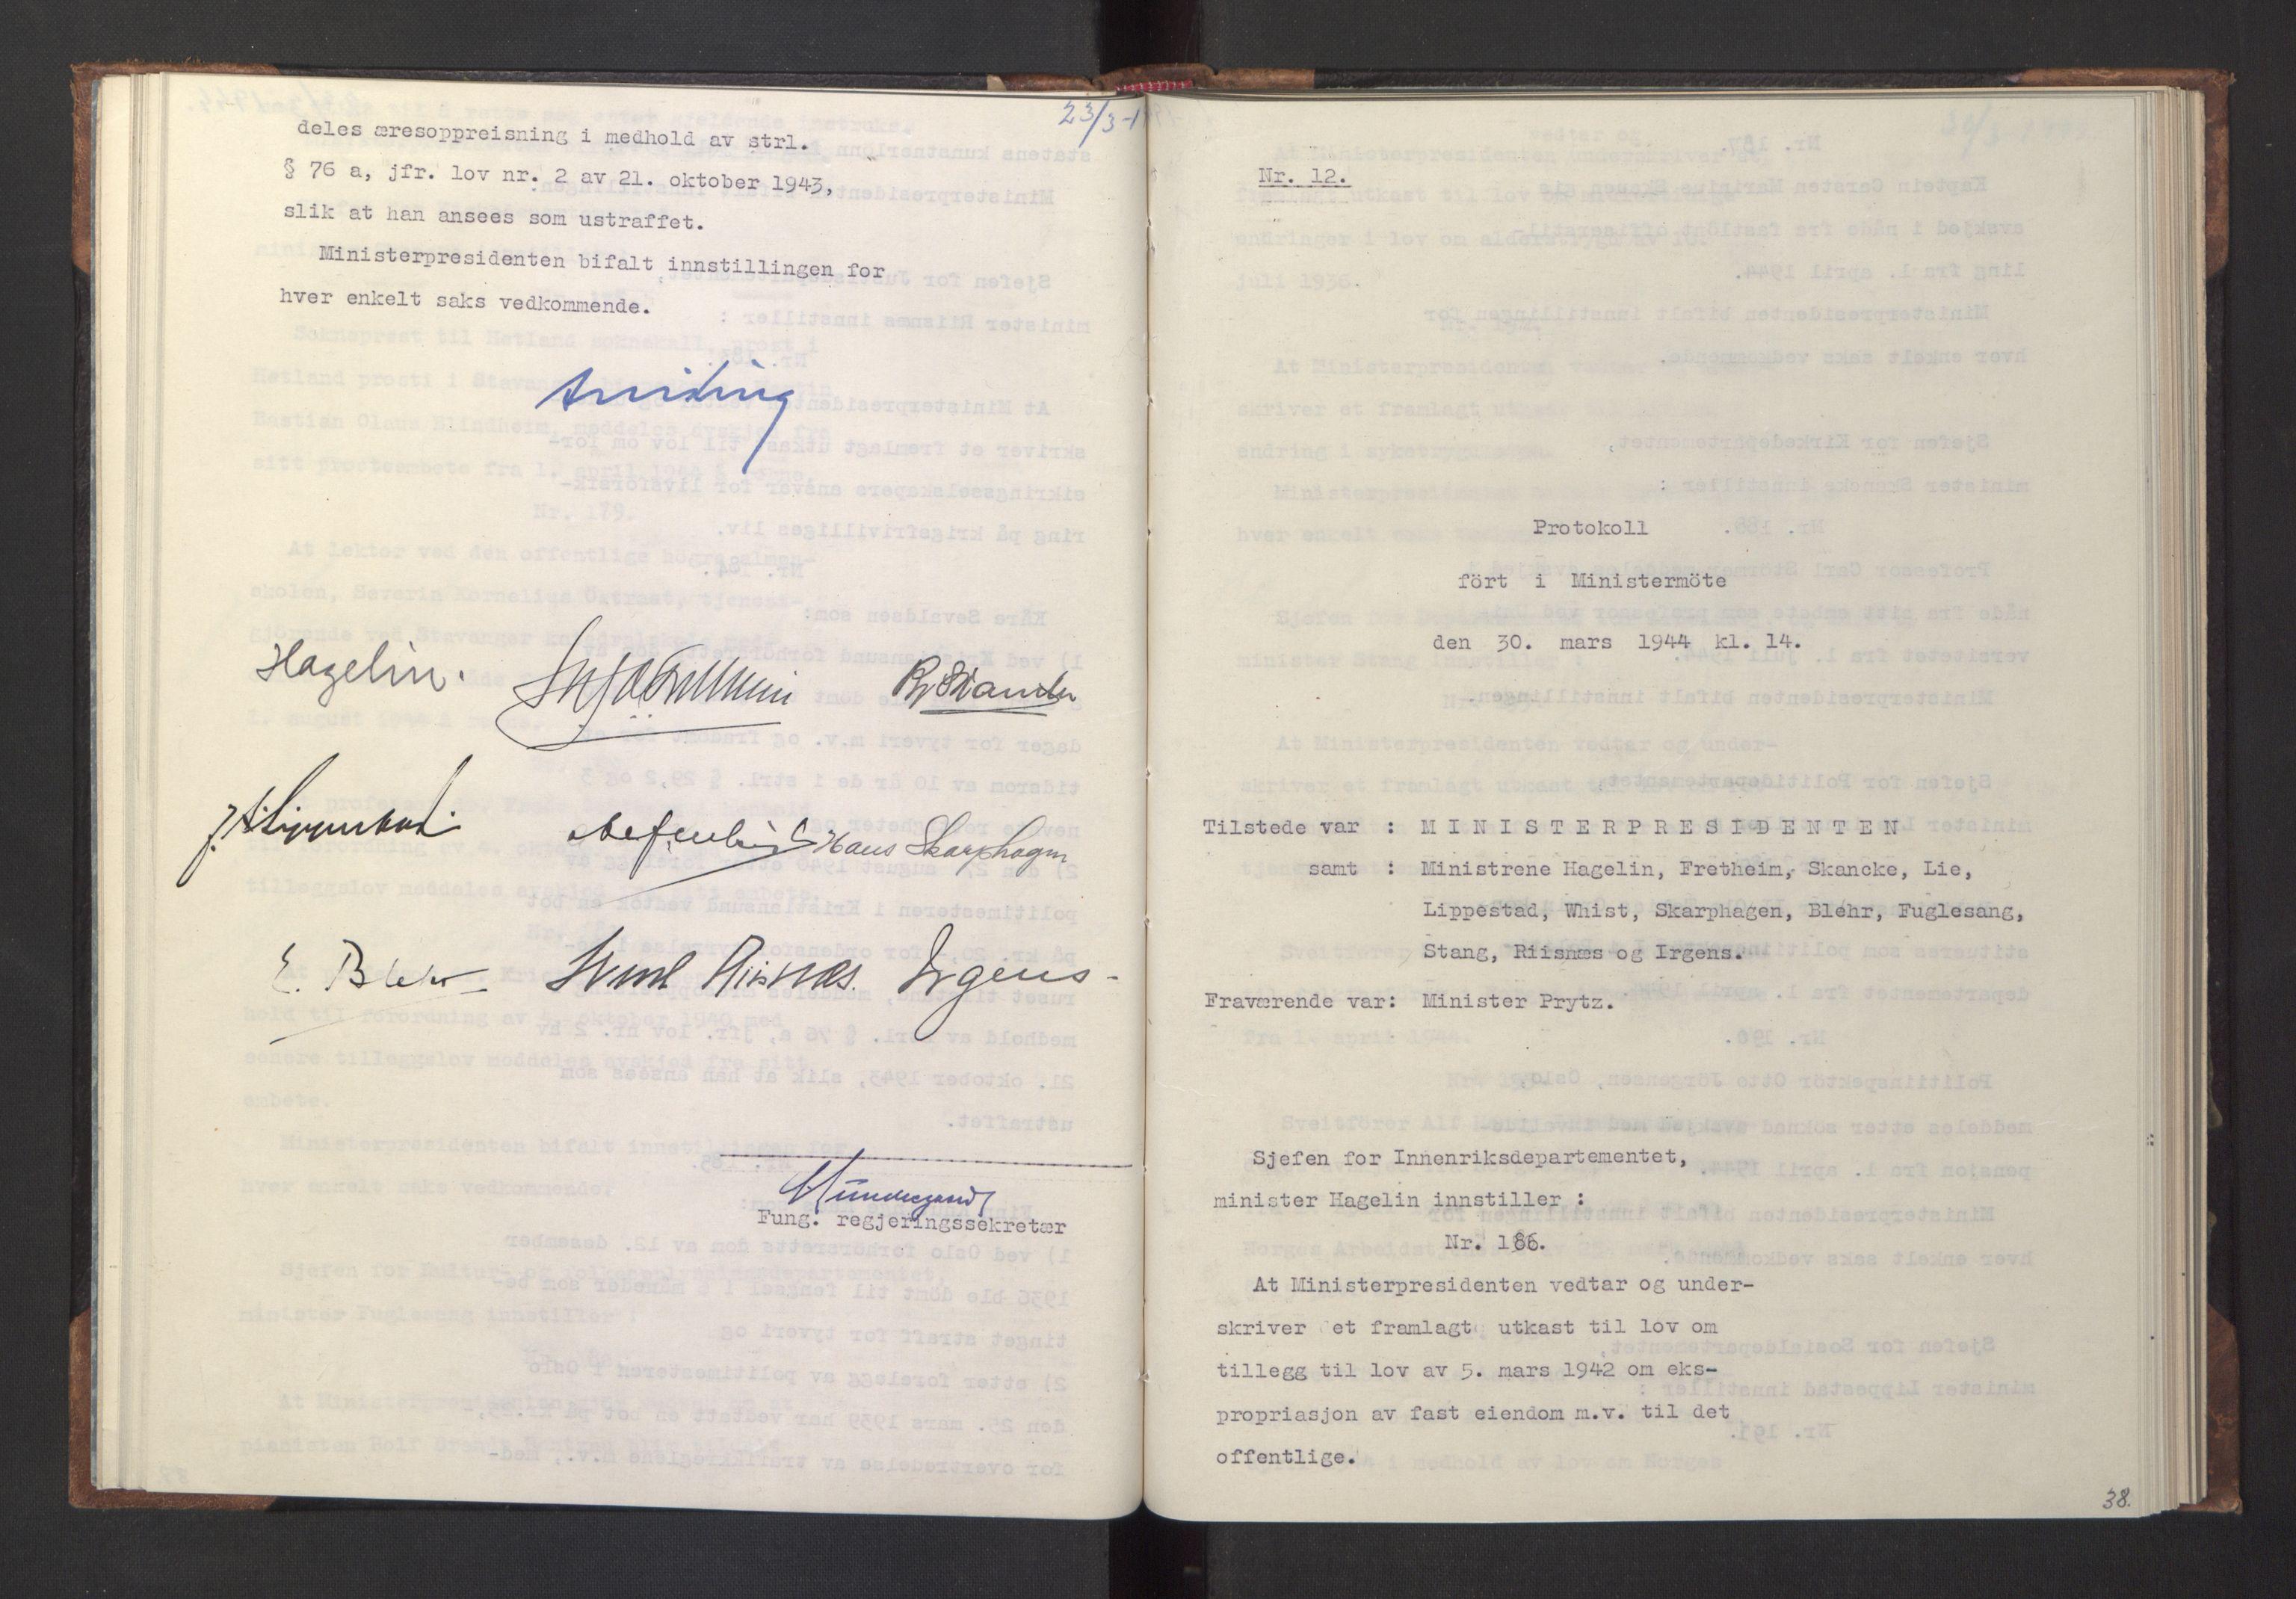 RA, NS-administrasjonen 1940-1945 (Statsrådsekretariatet, de kommisariske statsråder mm), D/Da/L0005: Protokoll fra ministermøter, 1944, s. 37b-38a